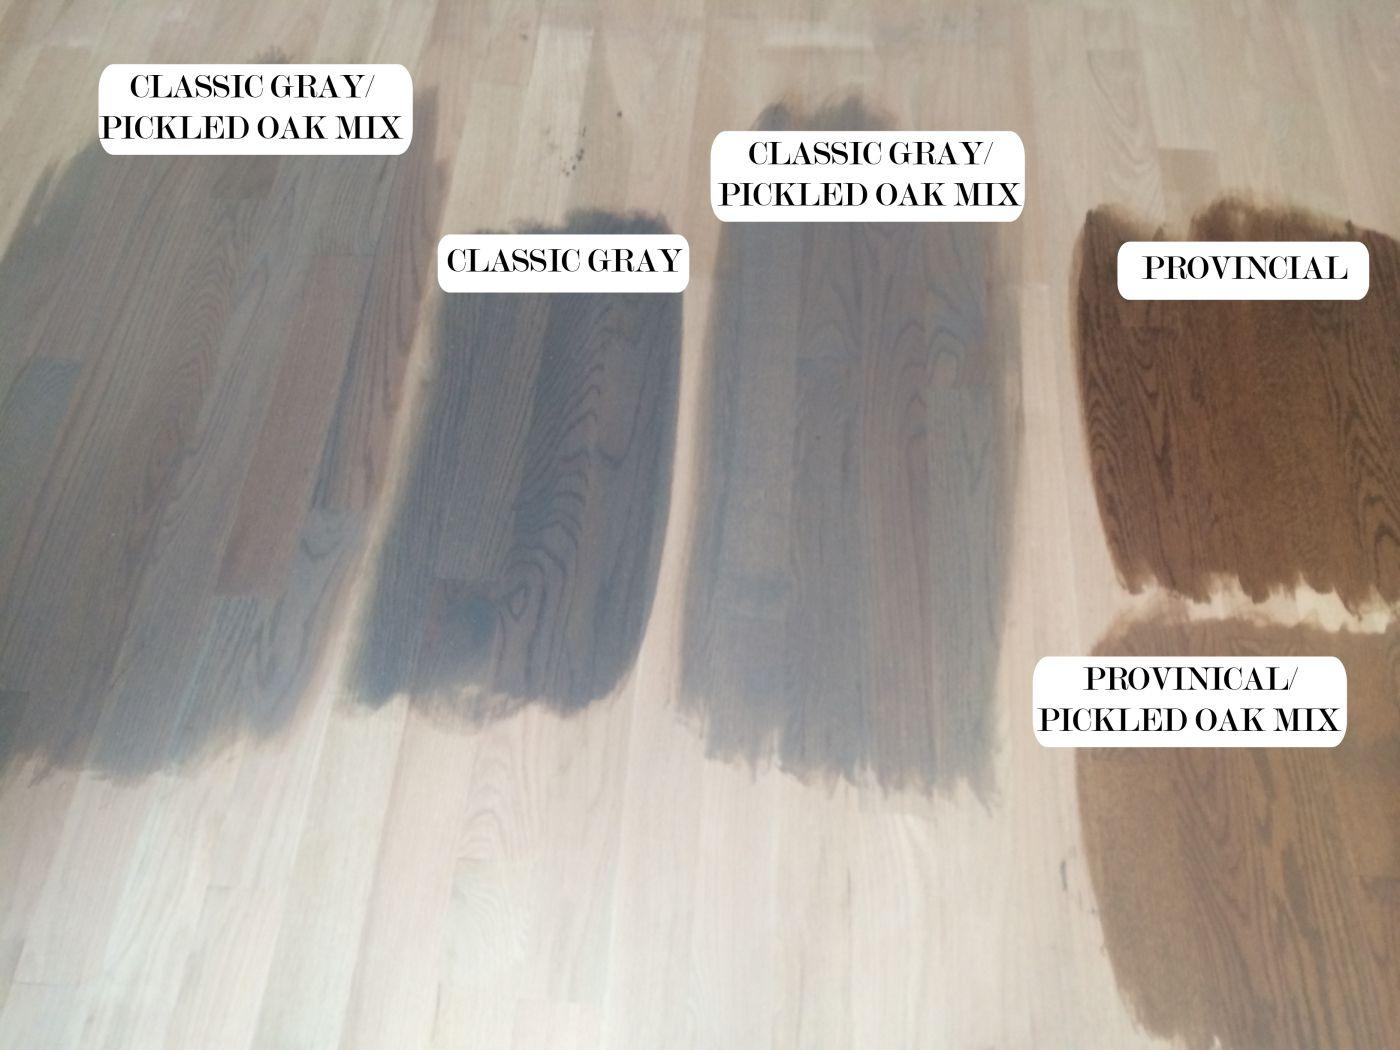 Minwax Floor Stains Www Theartesianproject Wordpress Com Oak Floor Stains Red Oak Wood Floors Staining Wood Floors